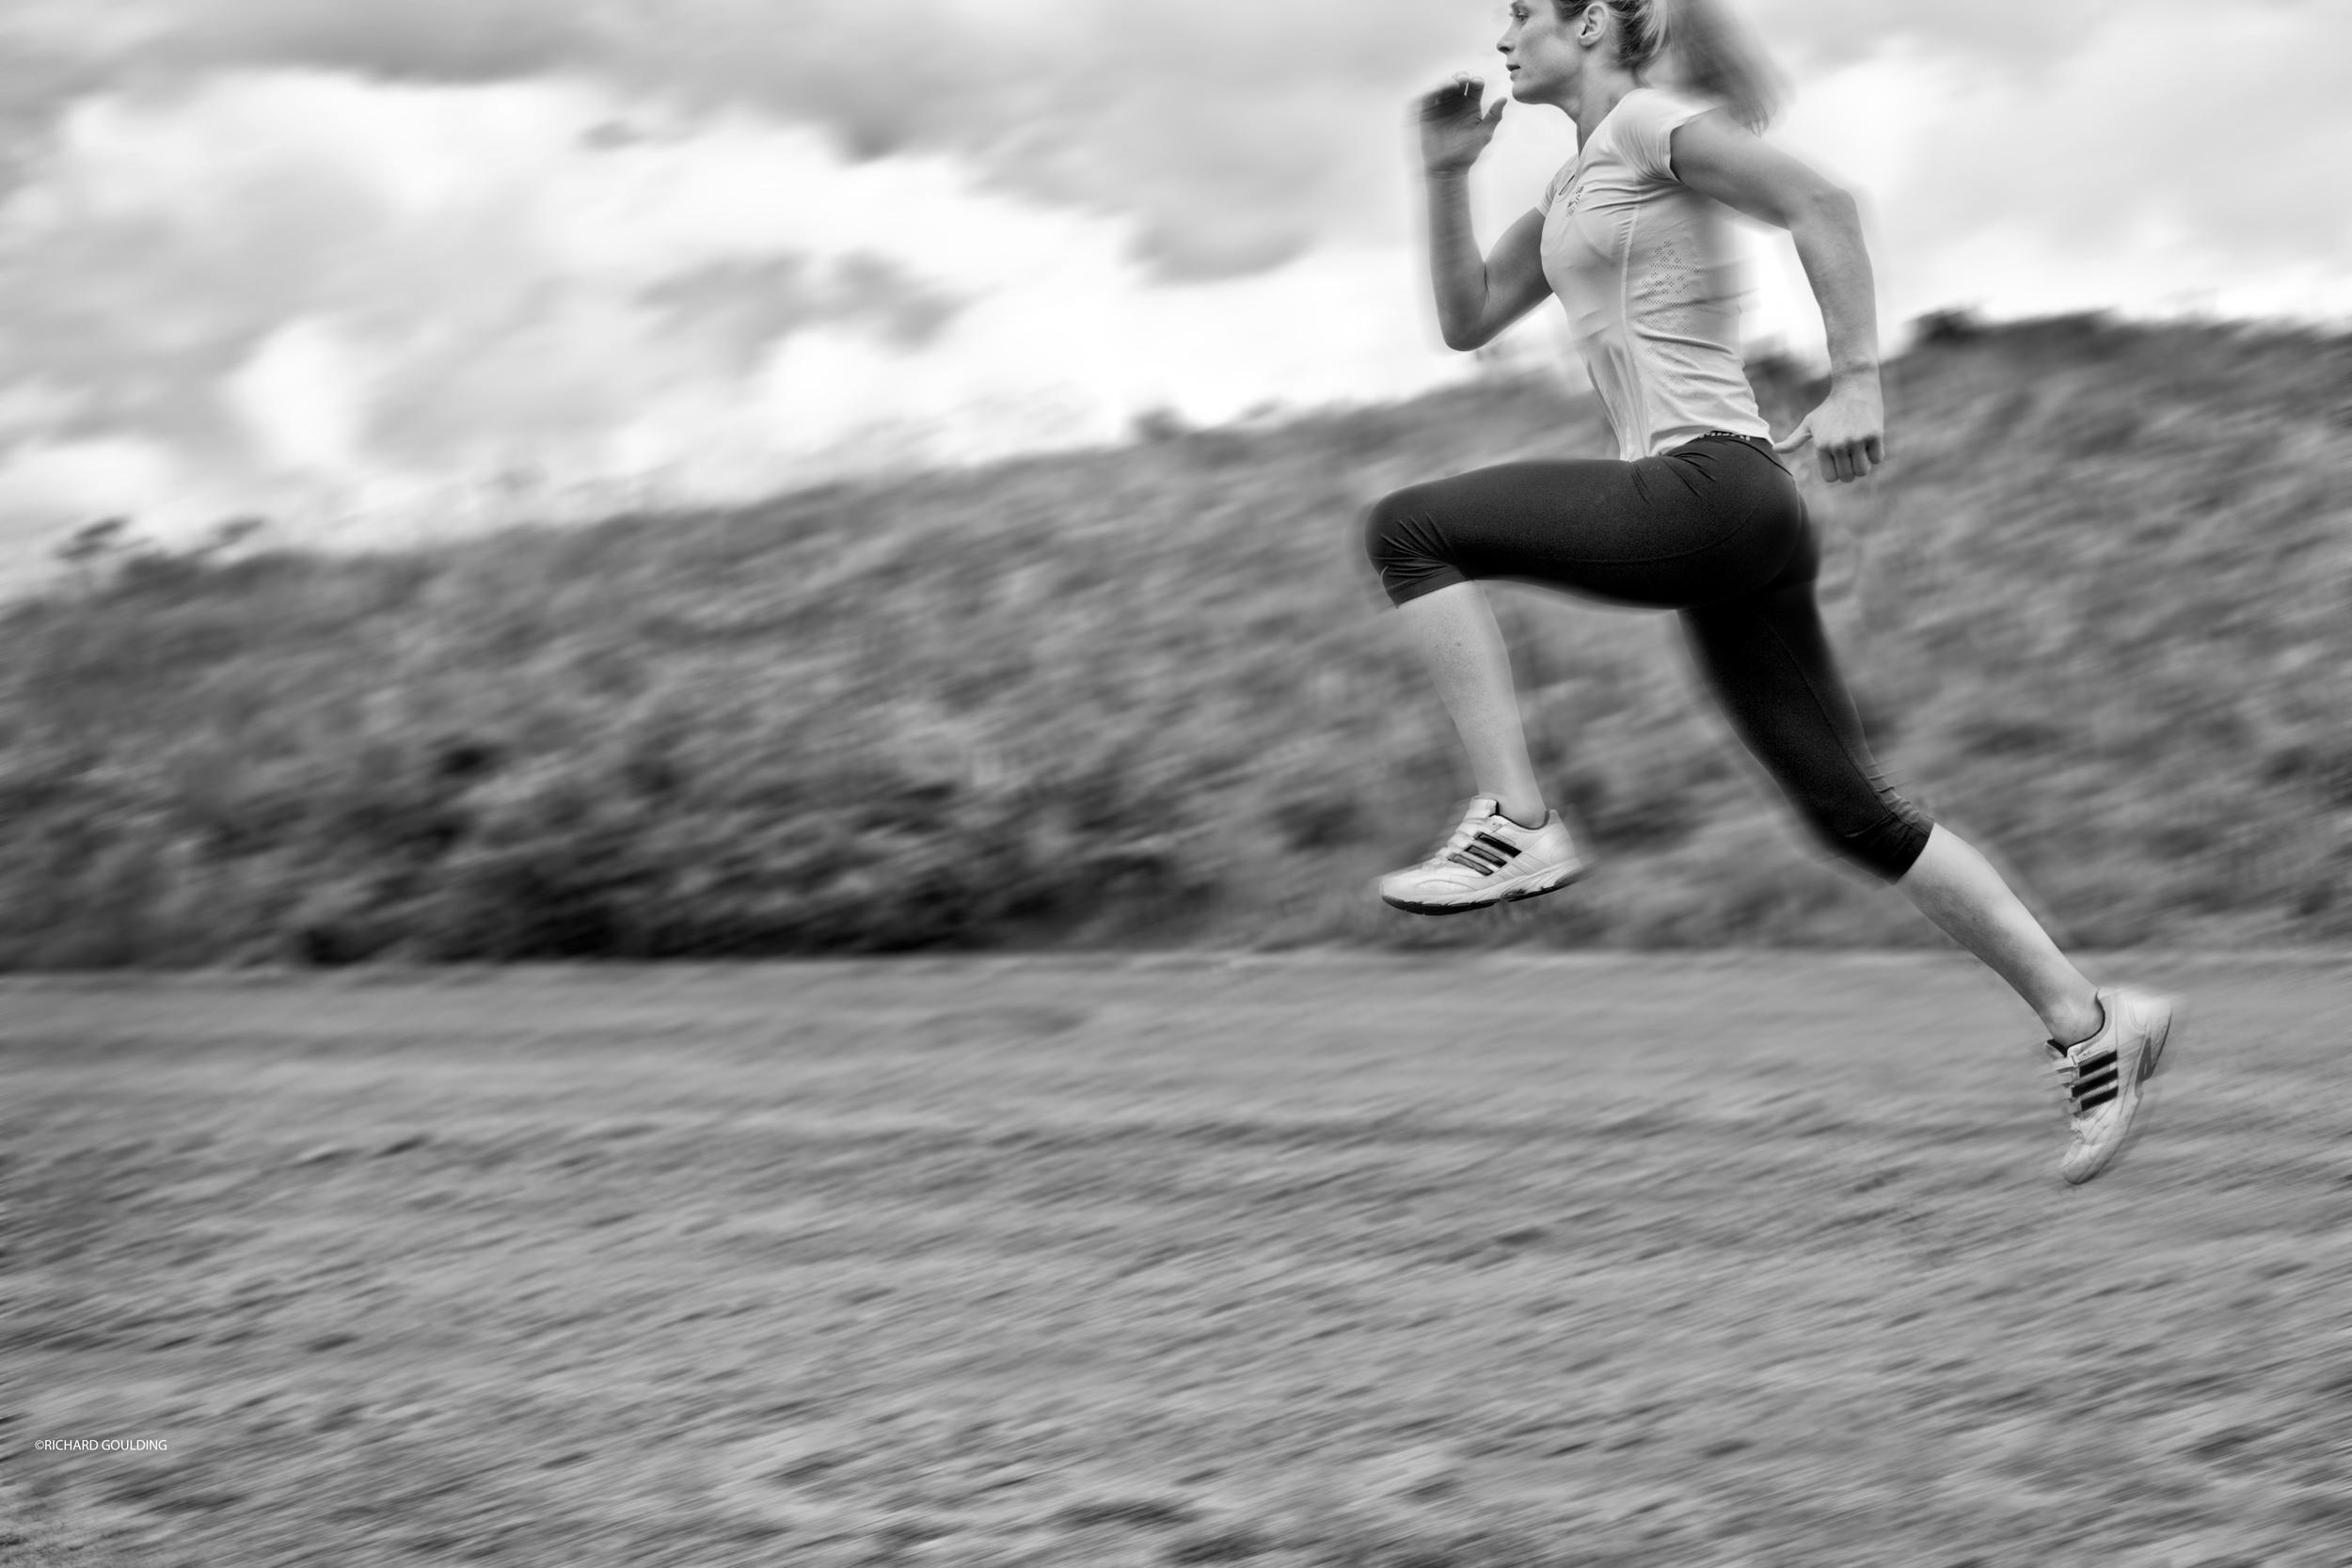 Sarah Clark, British Judo player, S&C training at Ratho, Judo Scotland Centre of Excellence.